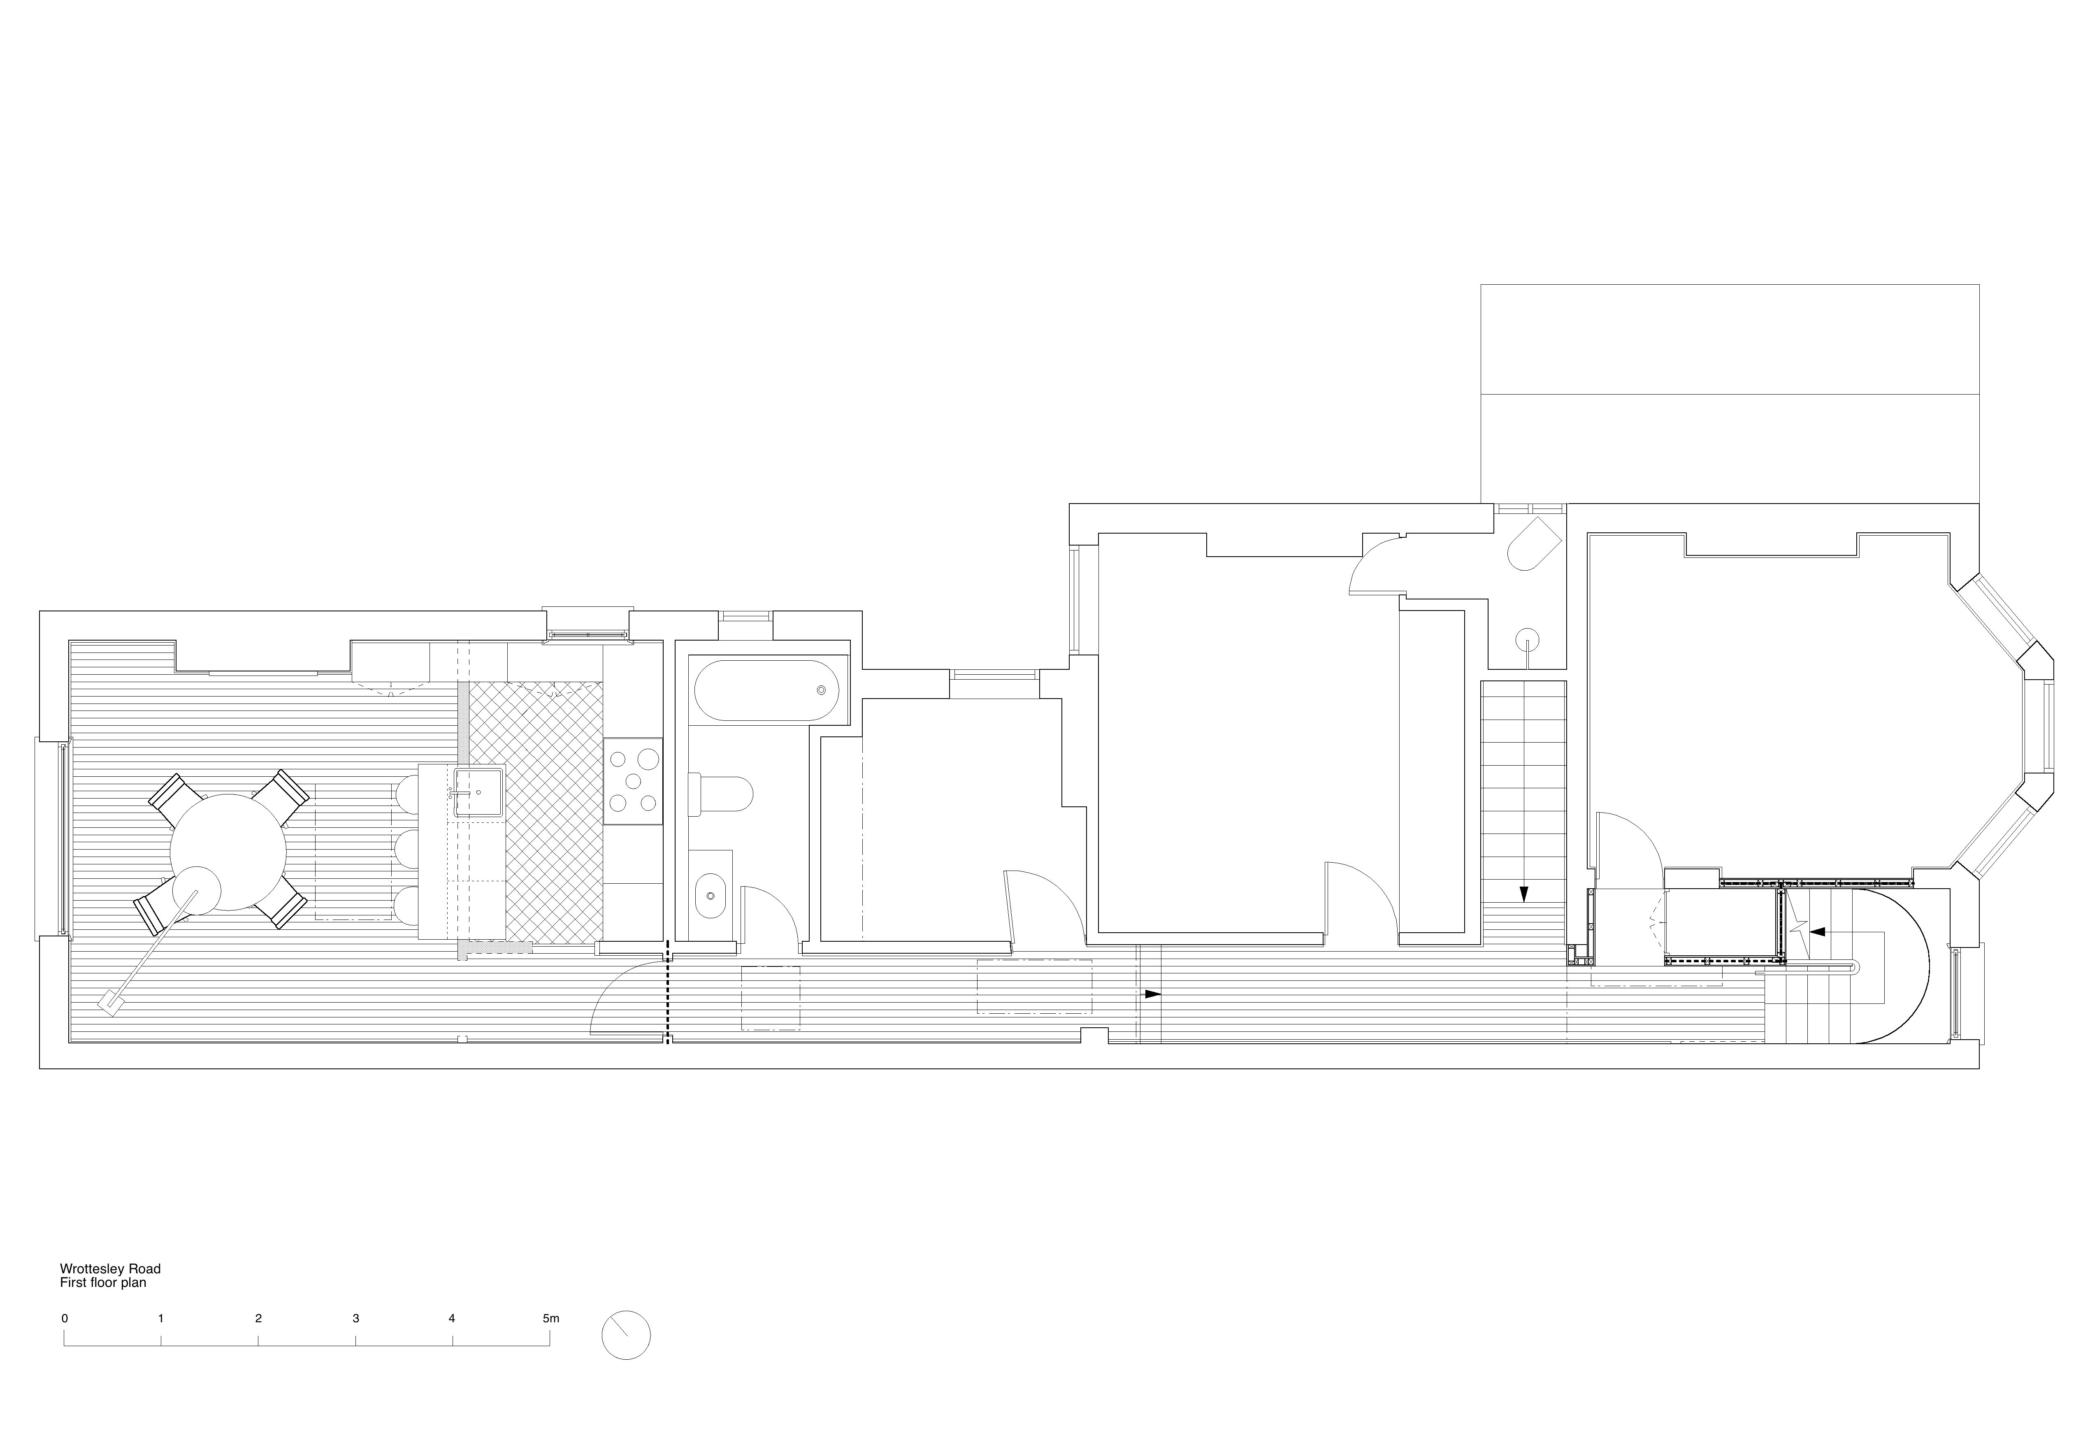 Wrottesley Road first floor plan